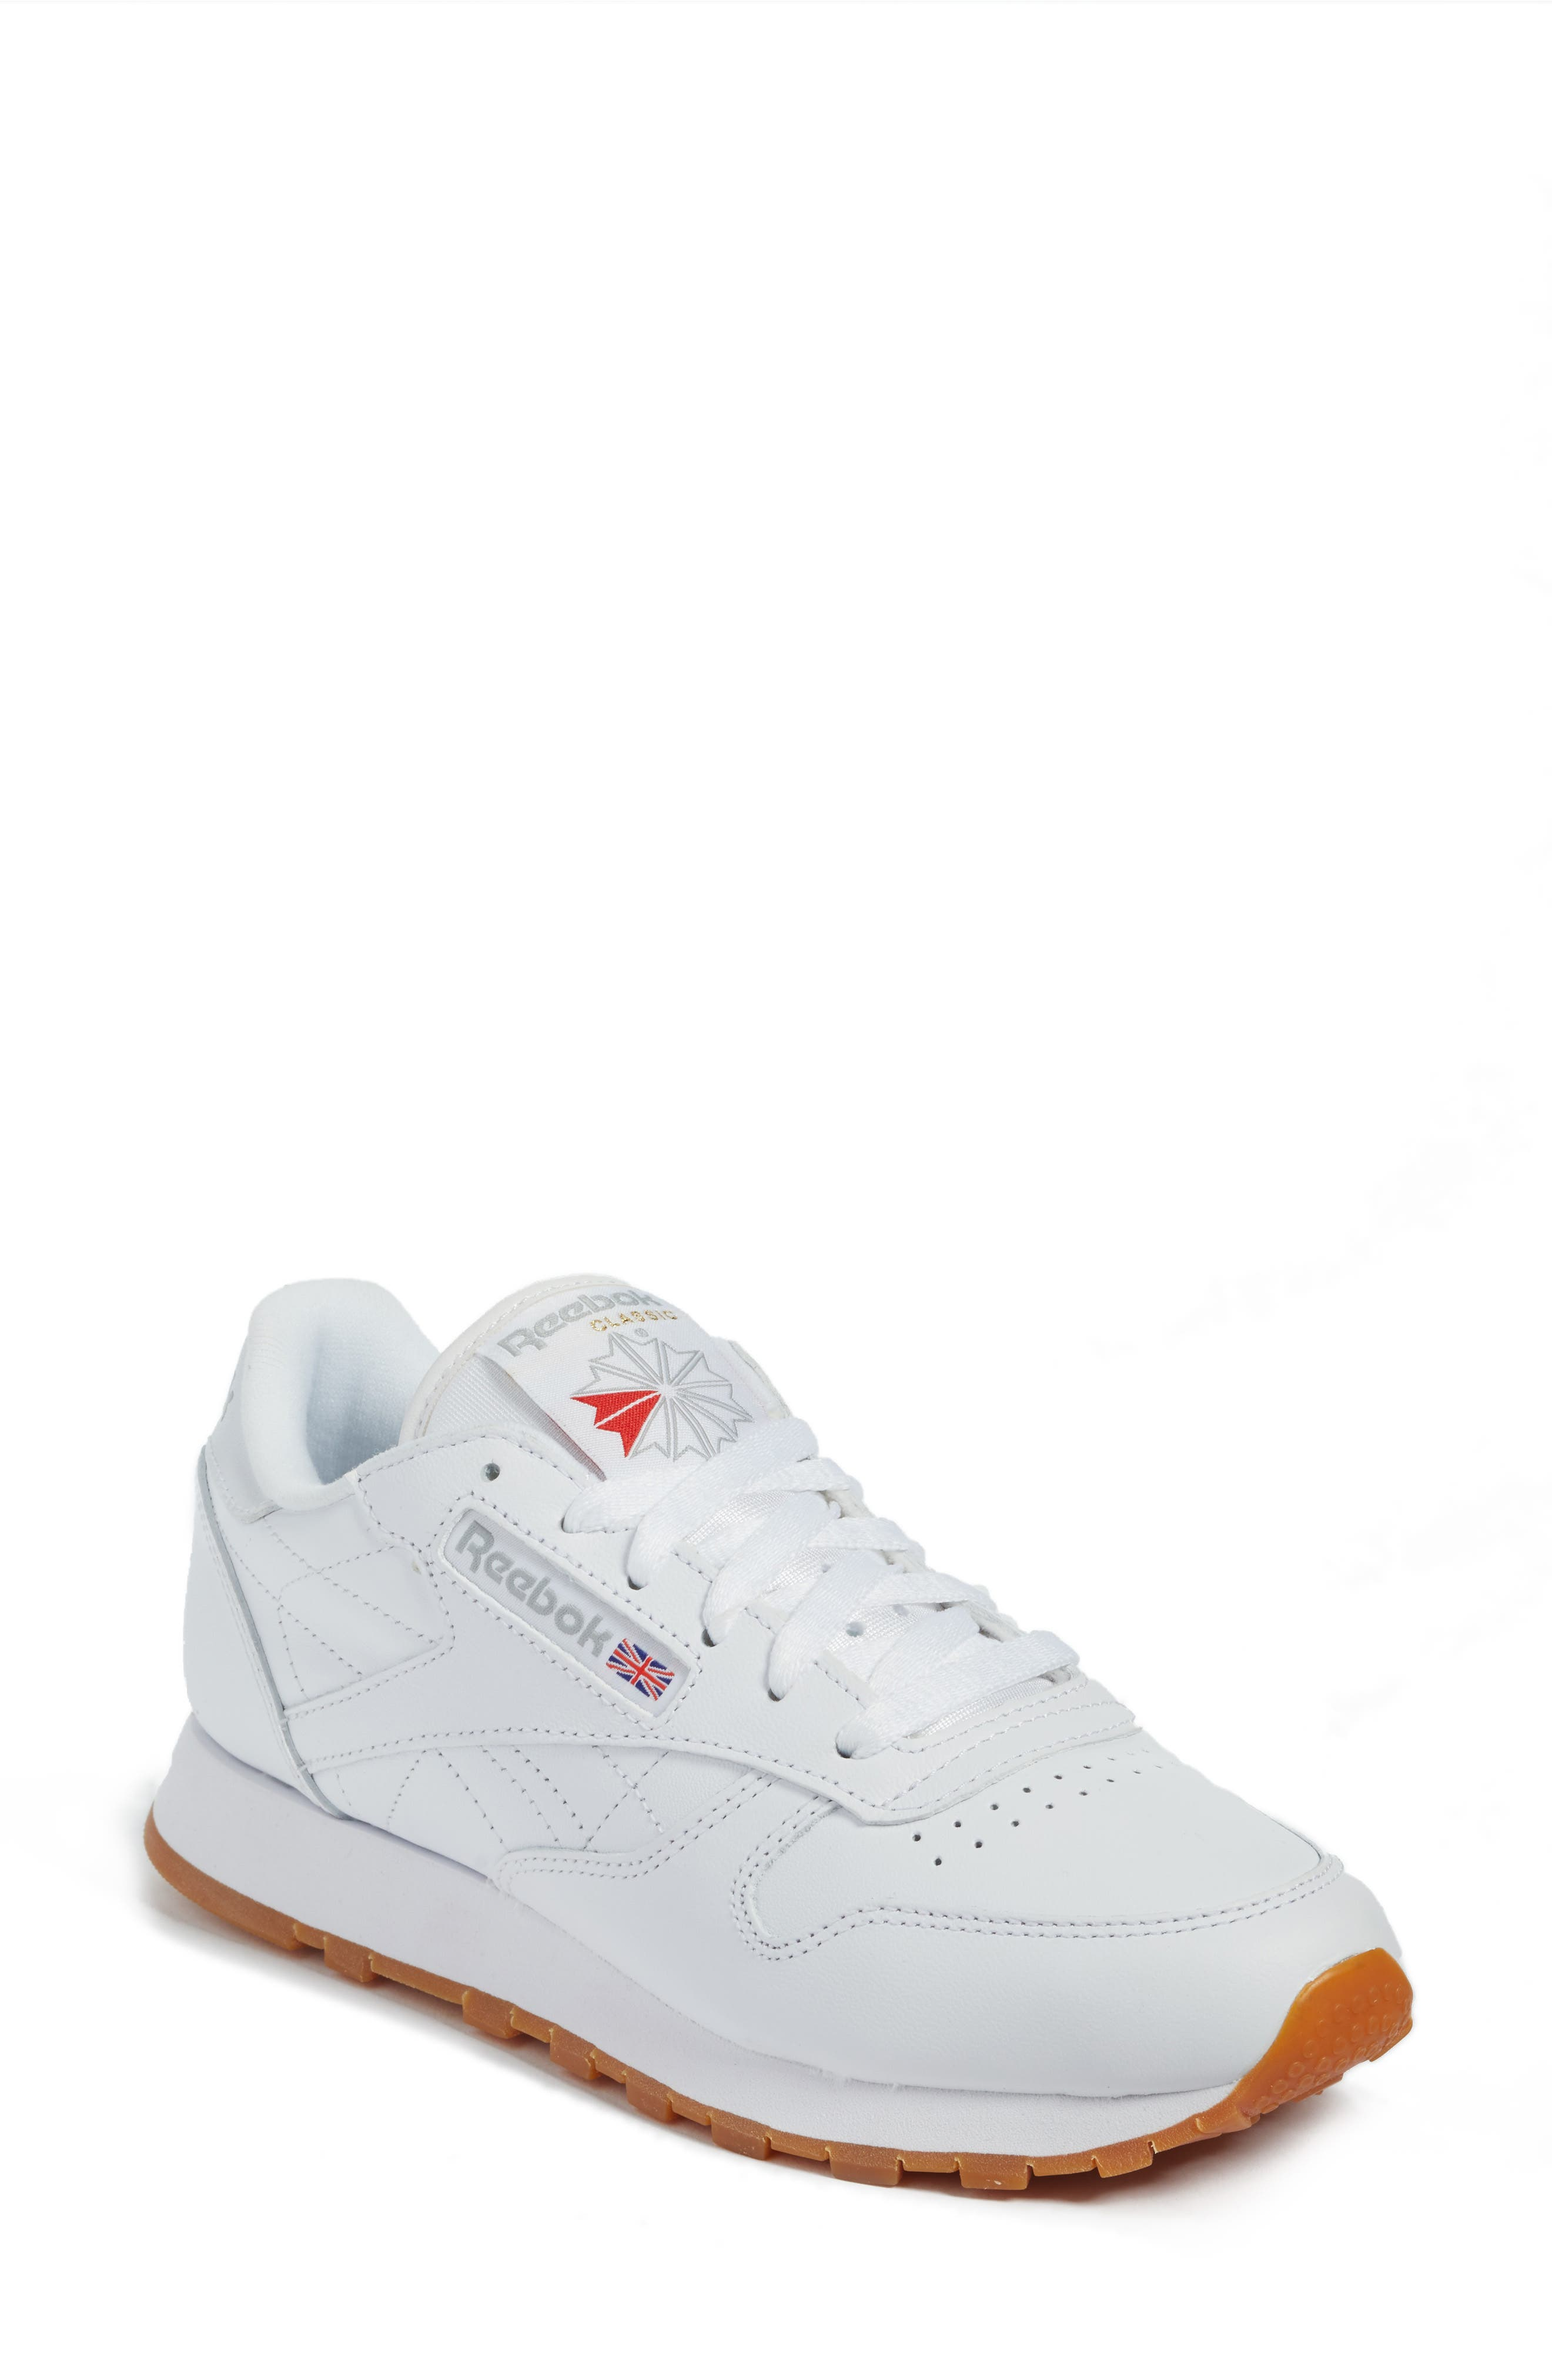 REEBOK, Classic Leather Sneaker, Main thumbnail 1, color, US-WHITE/ GUM